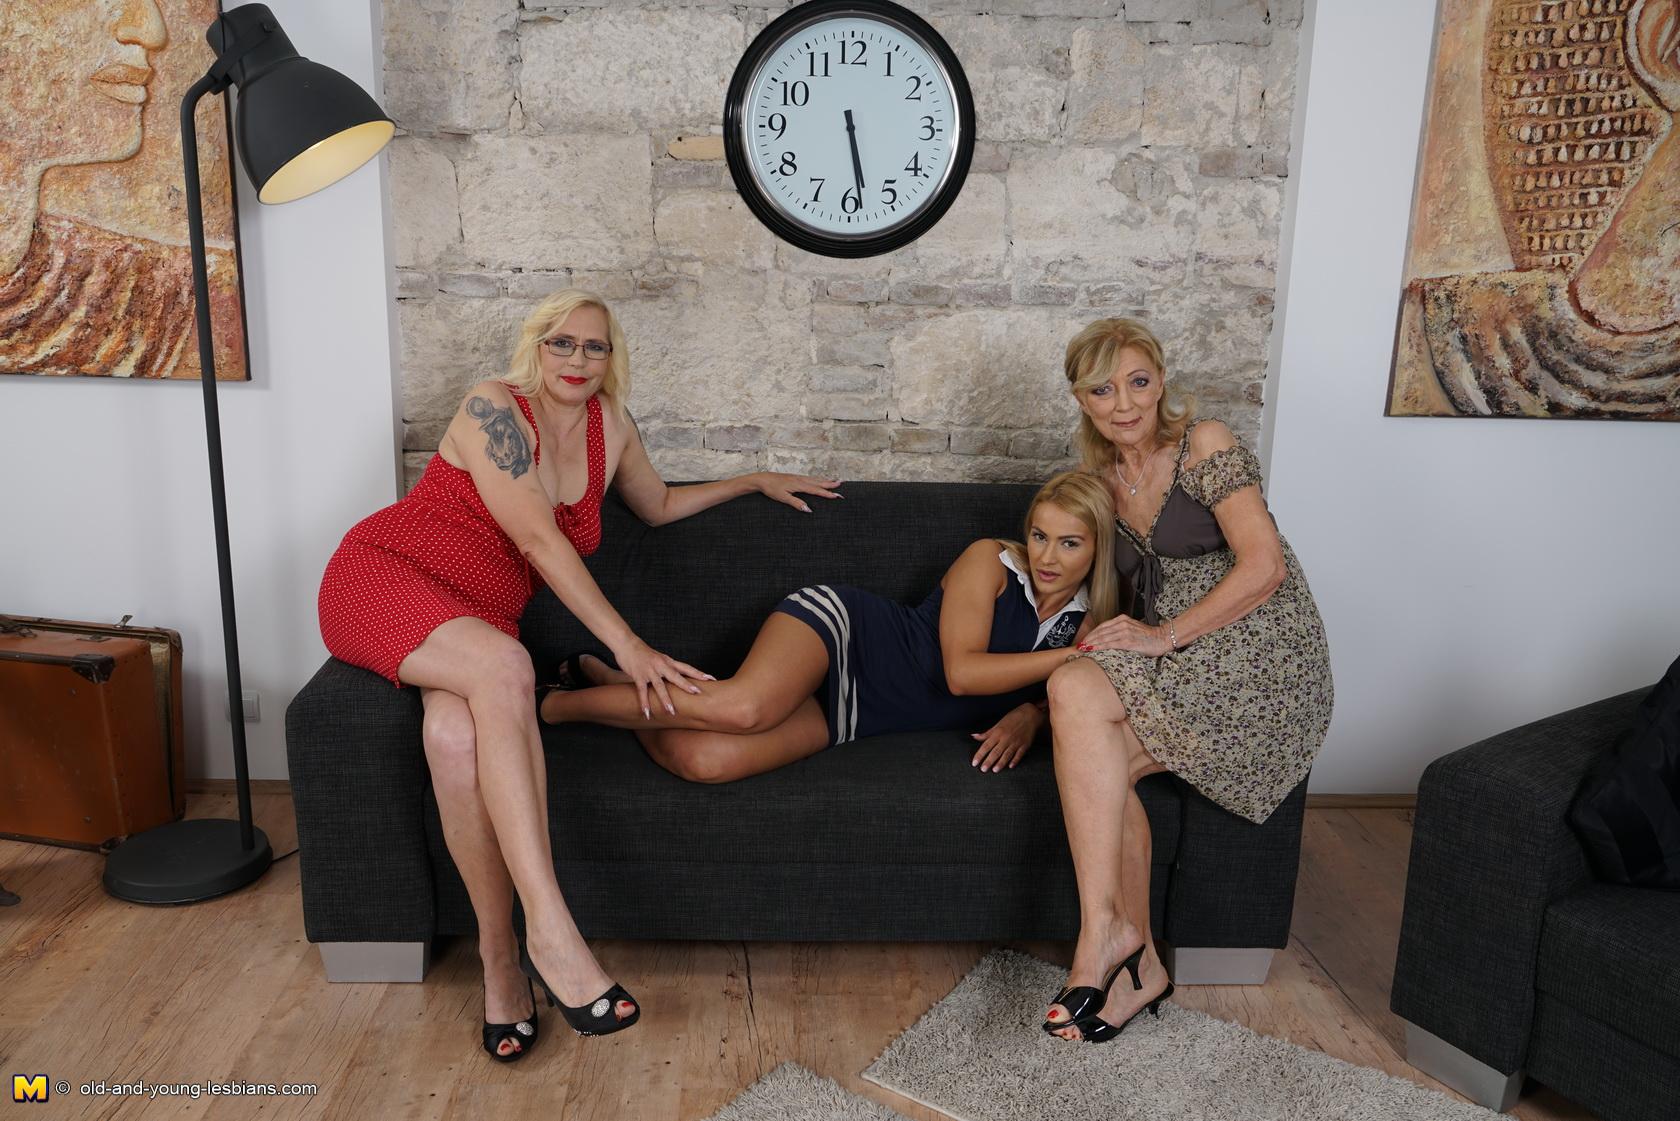 Young lesbian three